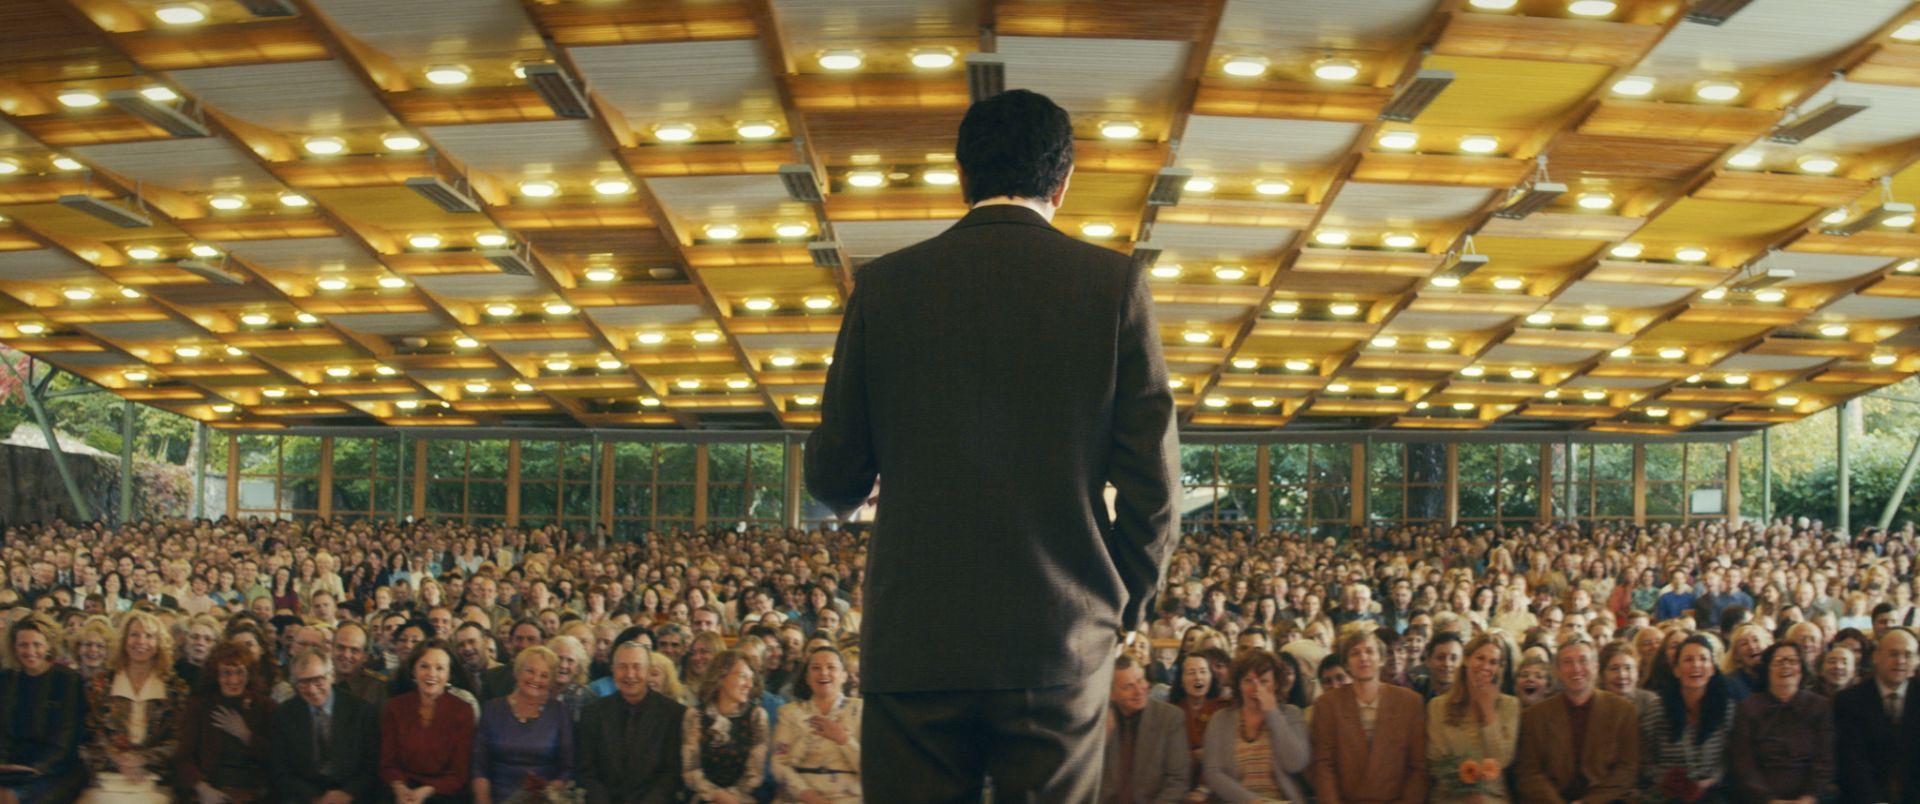 Кадр из фильма «Юморист»